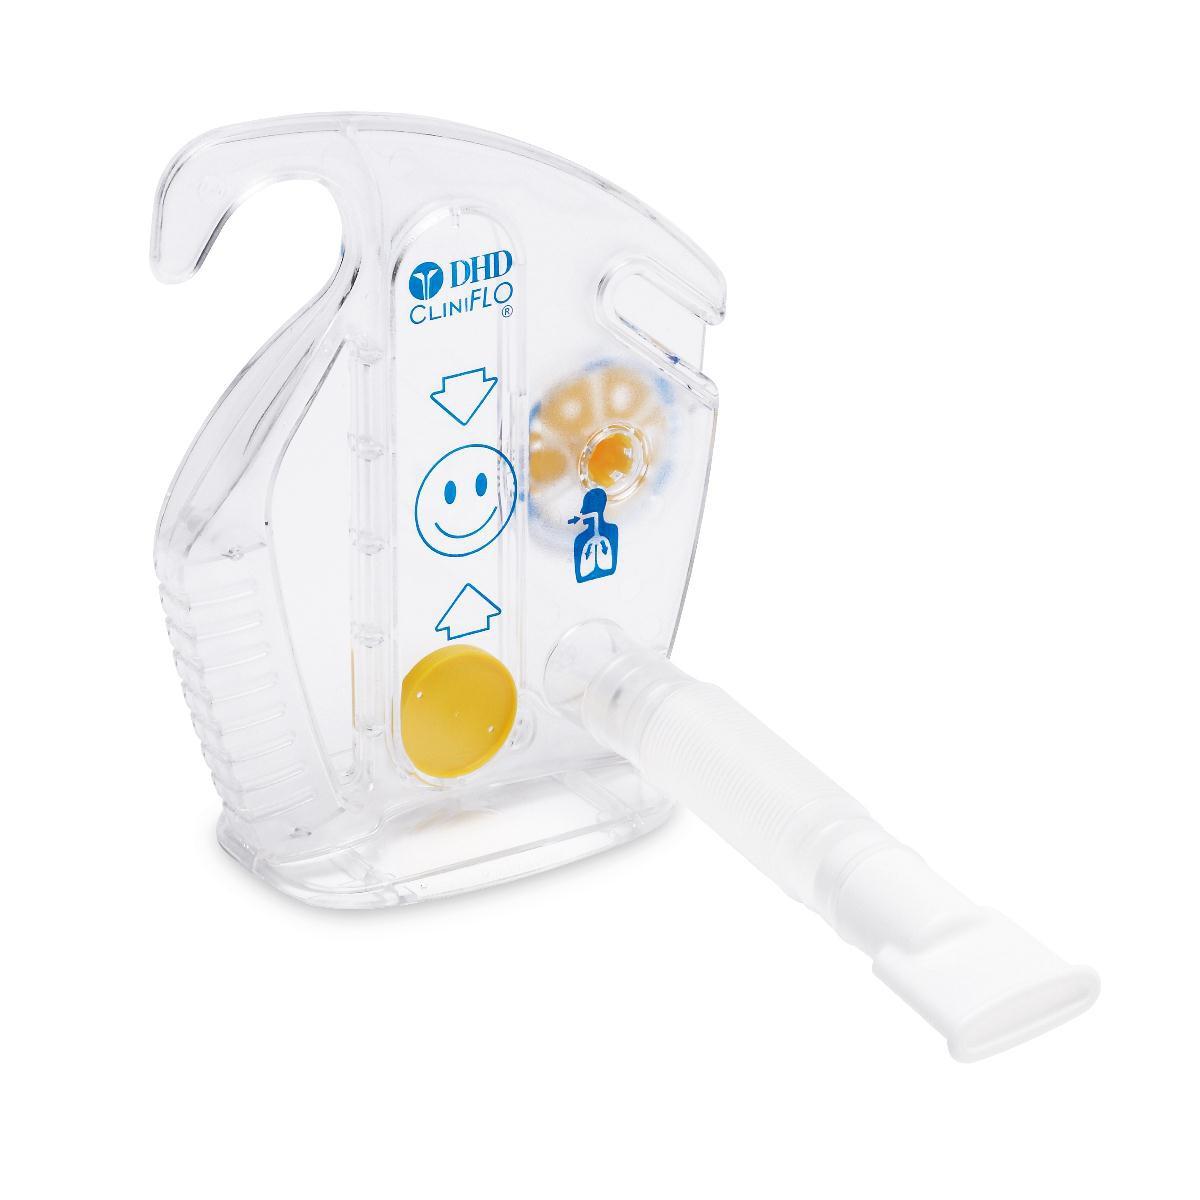 Dhd Cliniflo Flow Breathing Exerciser